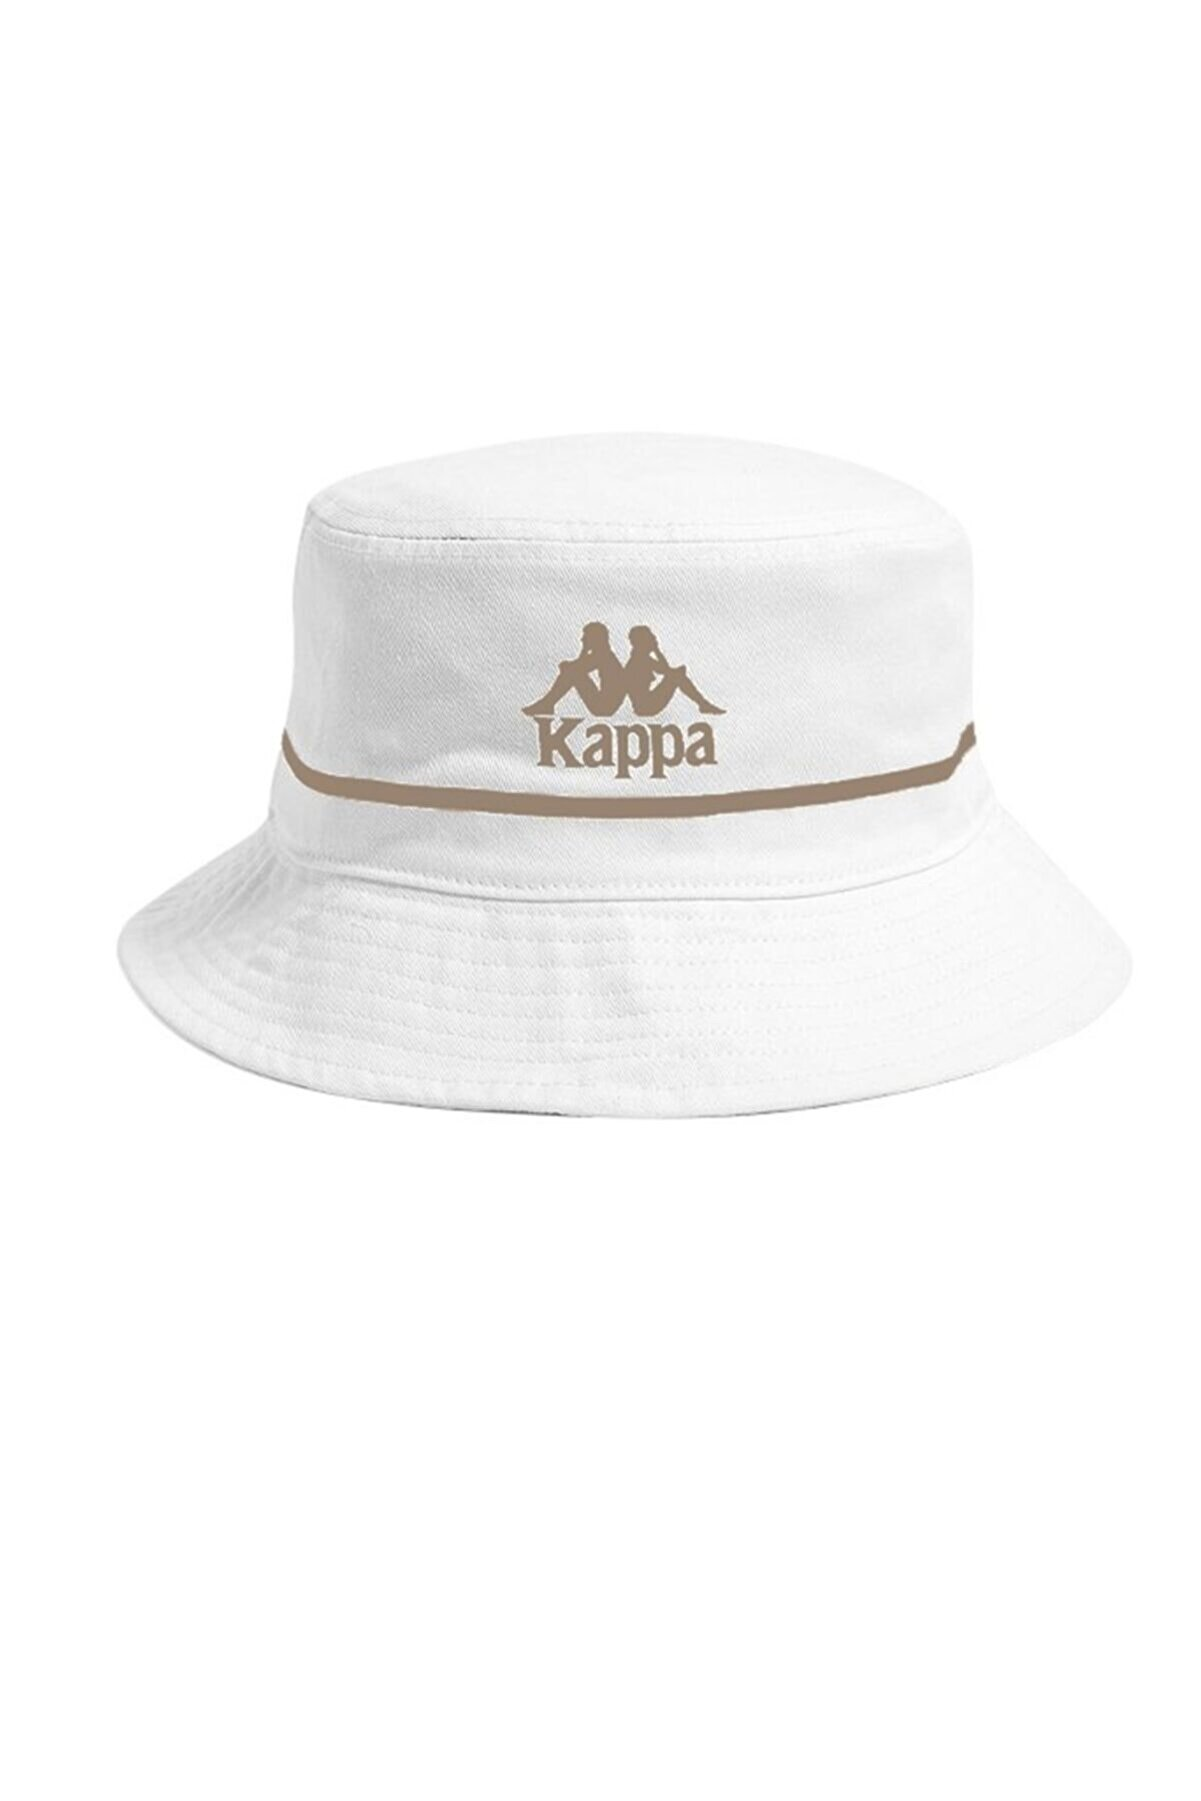 Kappa Kadın Safari Şapka Bucketo Ekru